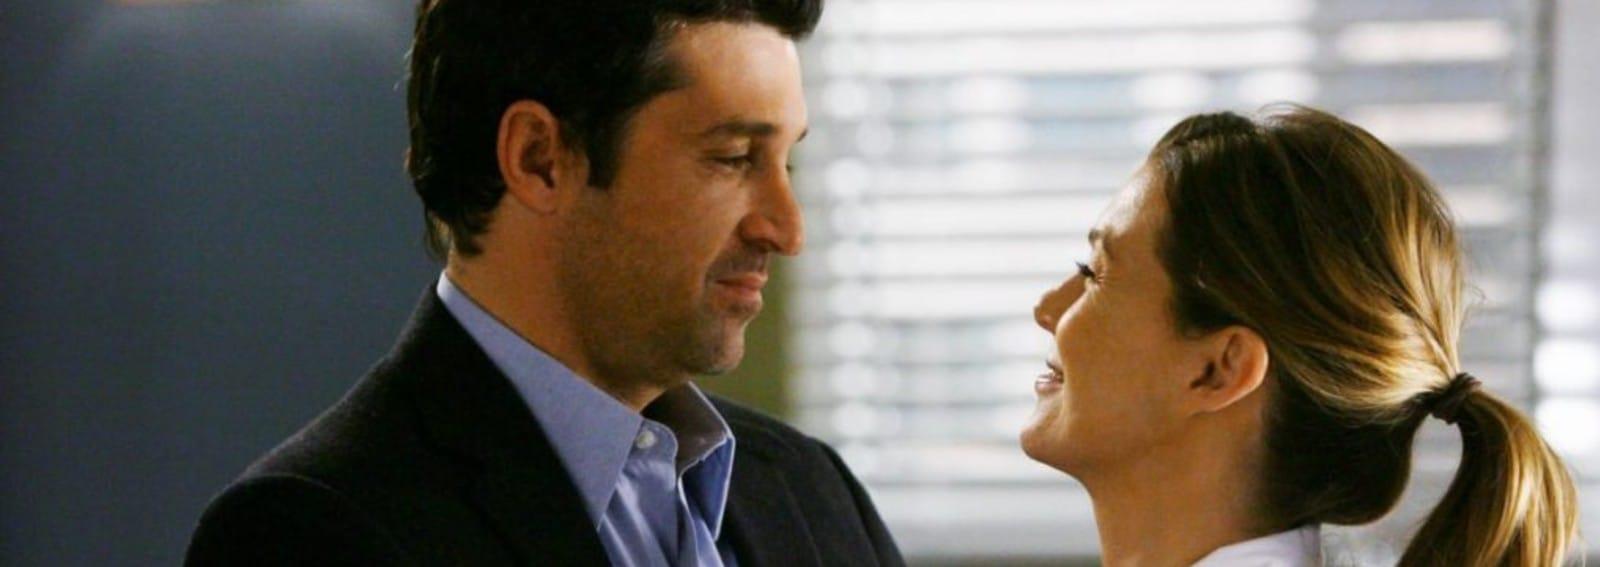 Grey's Anatomy Meredith Derek hero